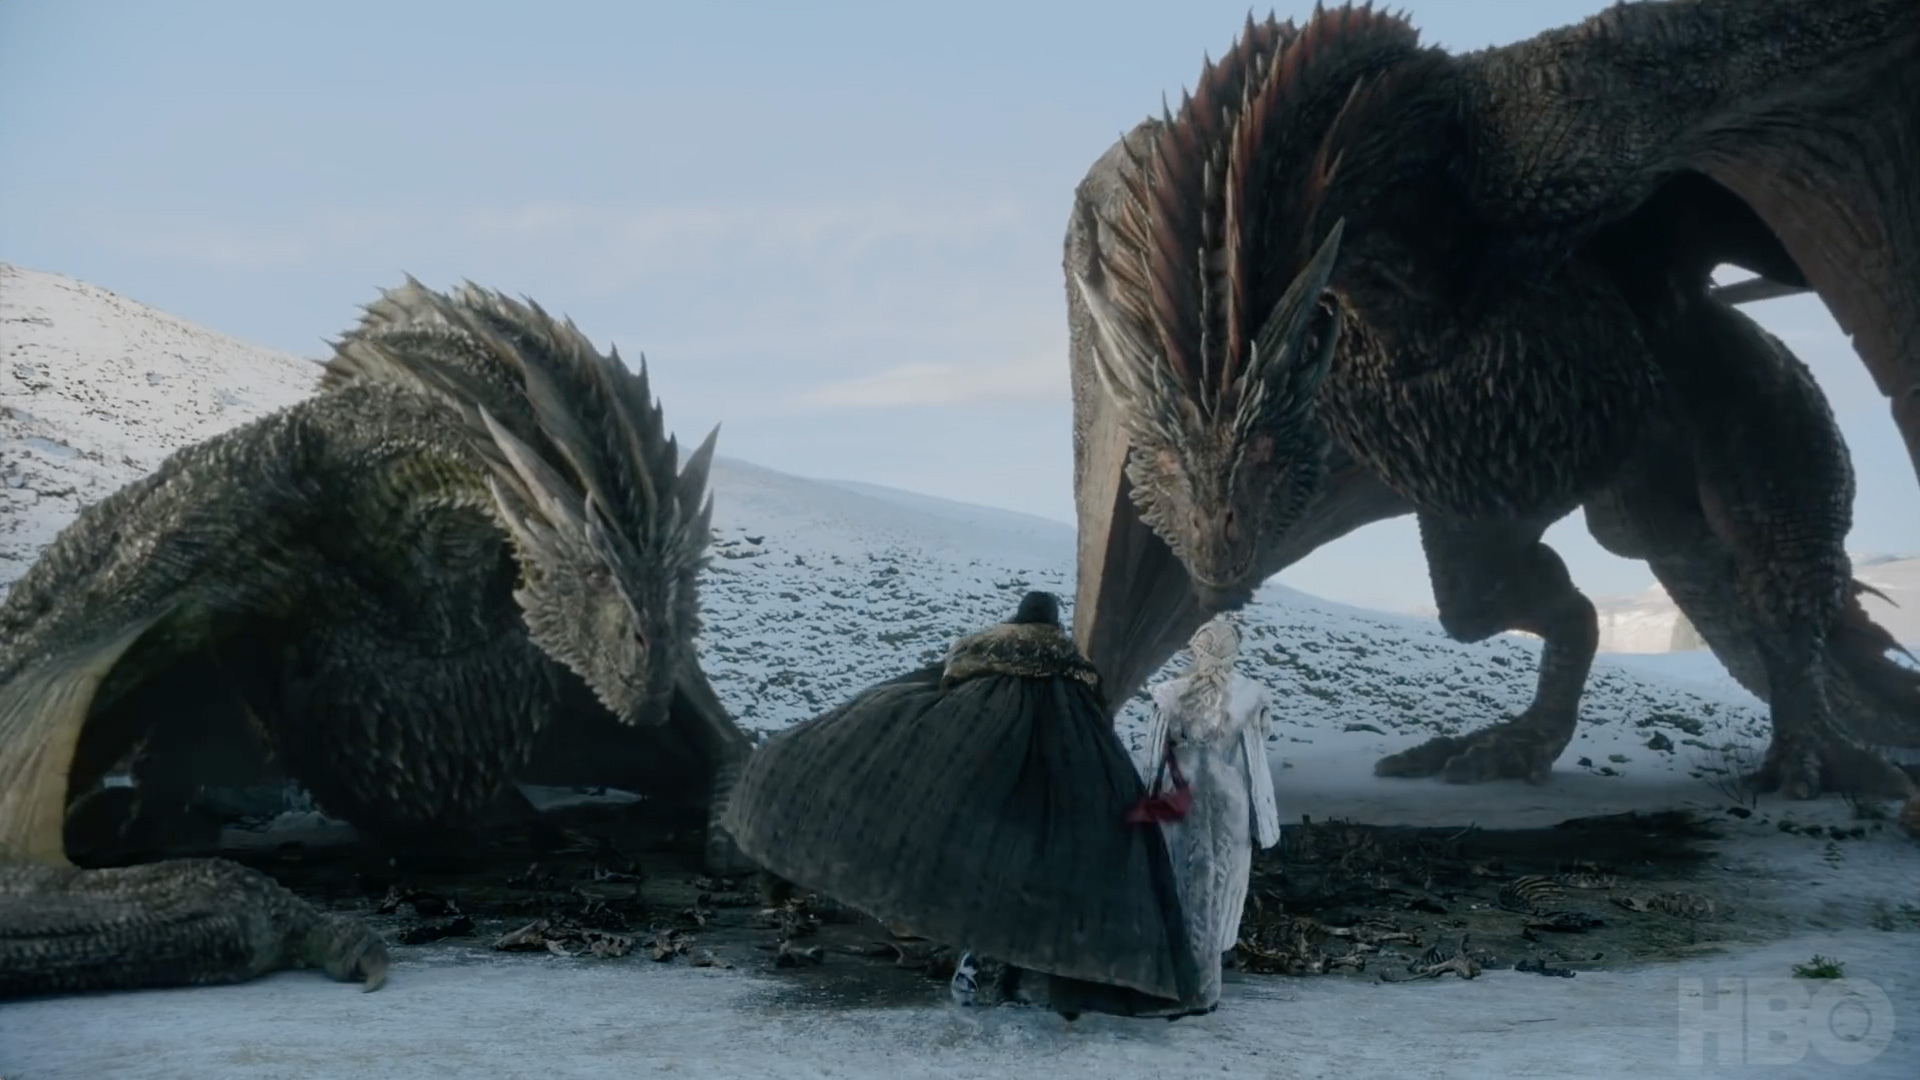 Game Of Thrones Season 8 The Art Of Vfxthe Art Of Vfx